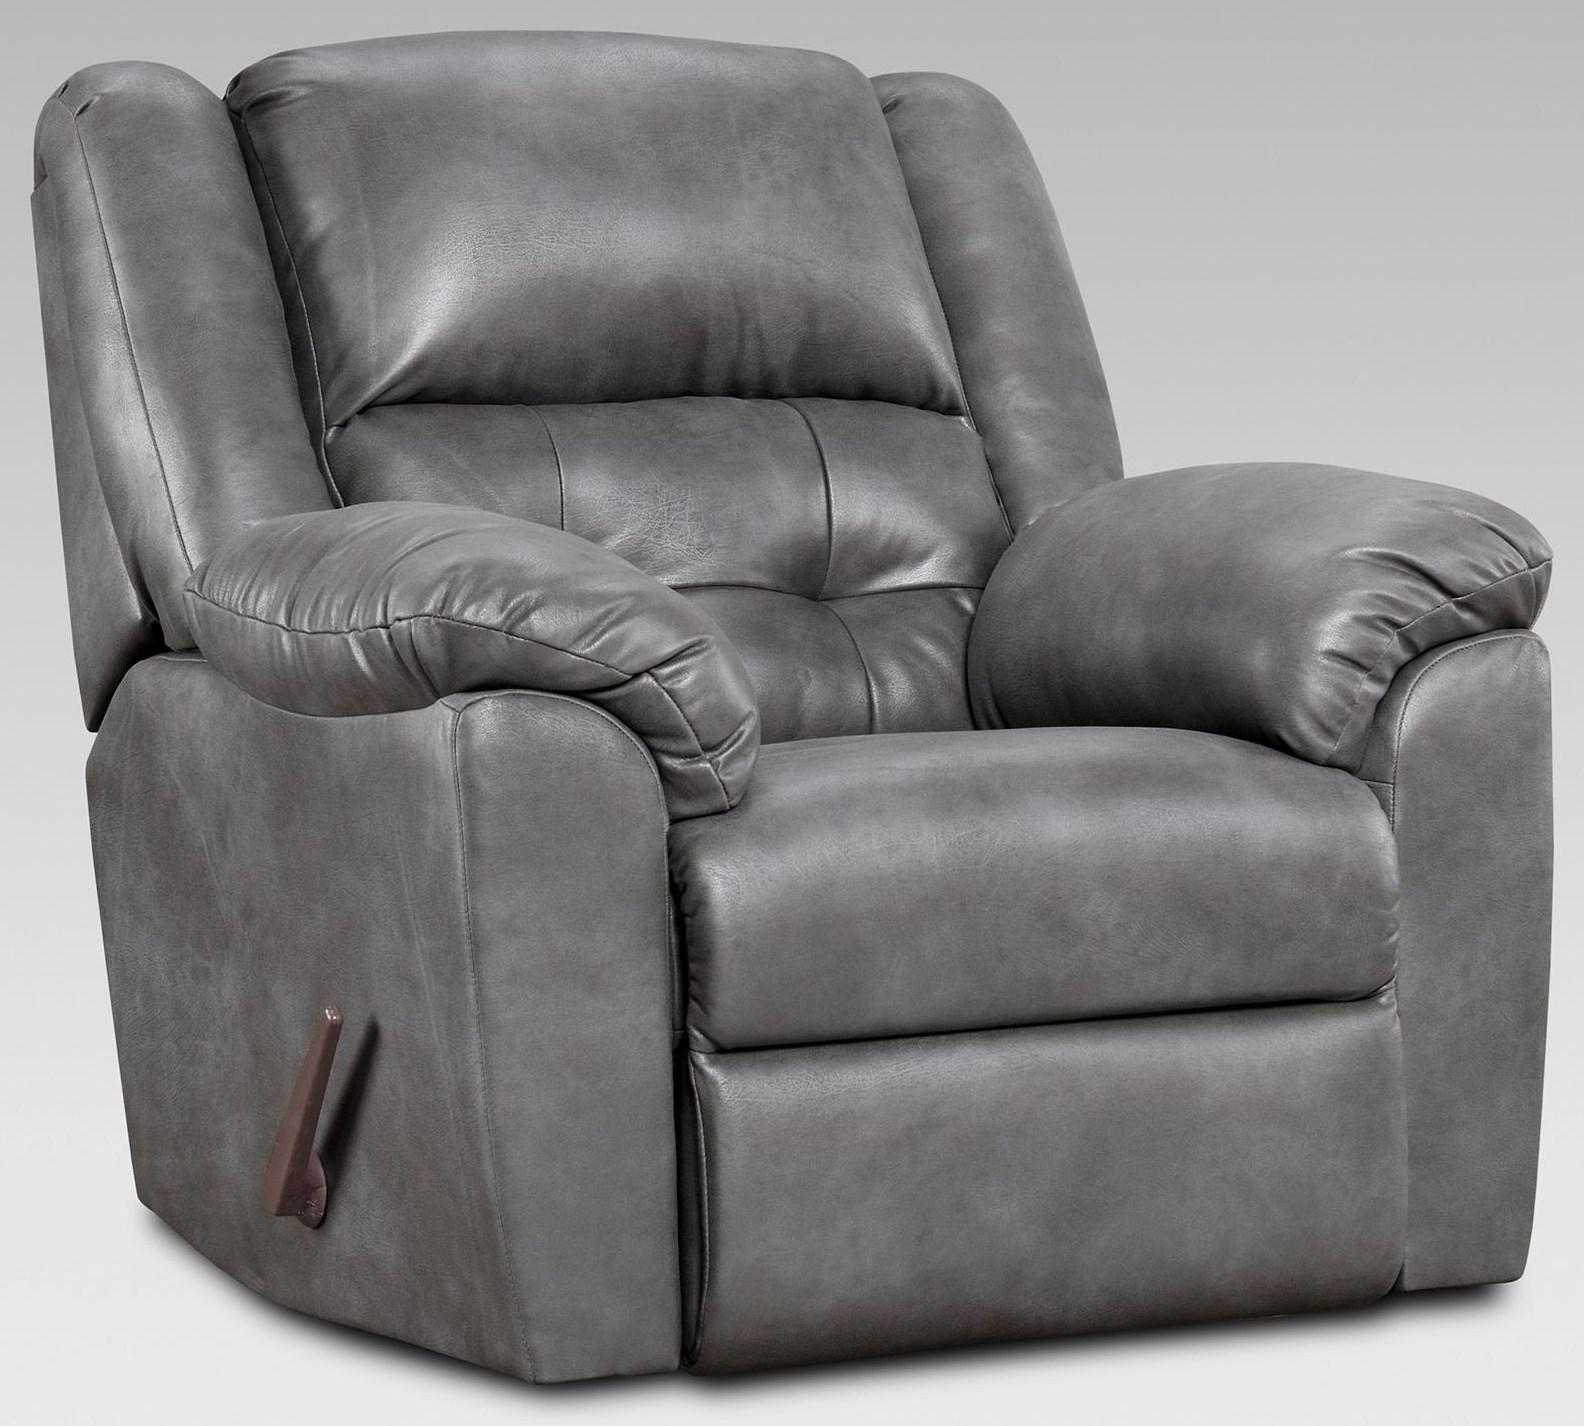 2550 Telluride Charcoal Rocker Recliner by Affordable Furniture at Furniture Fair - North Carolina